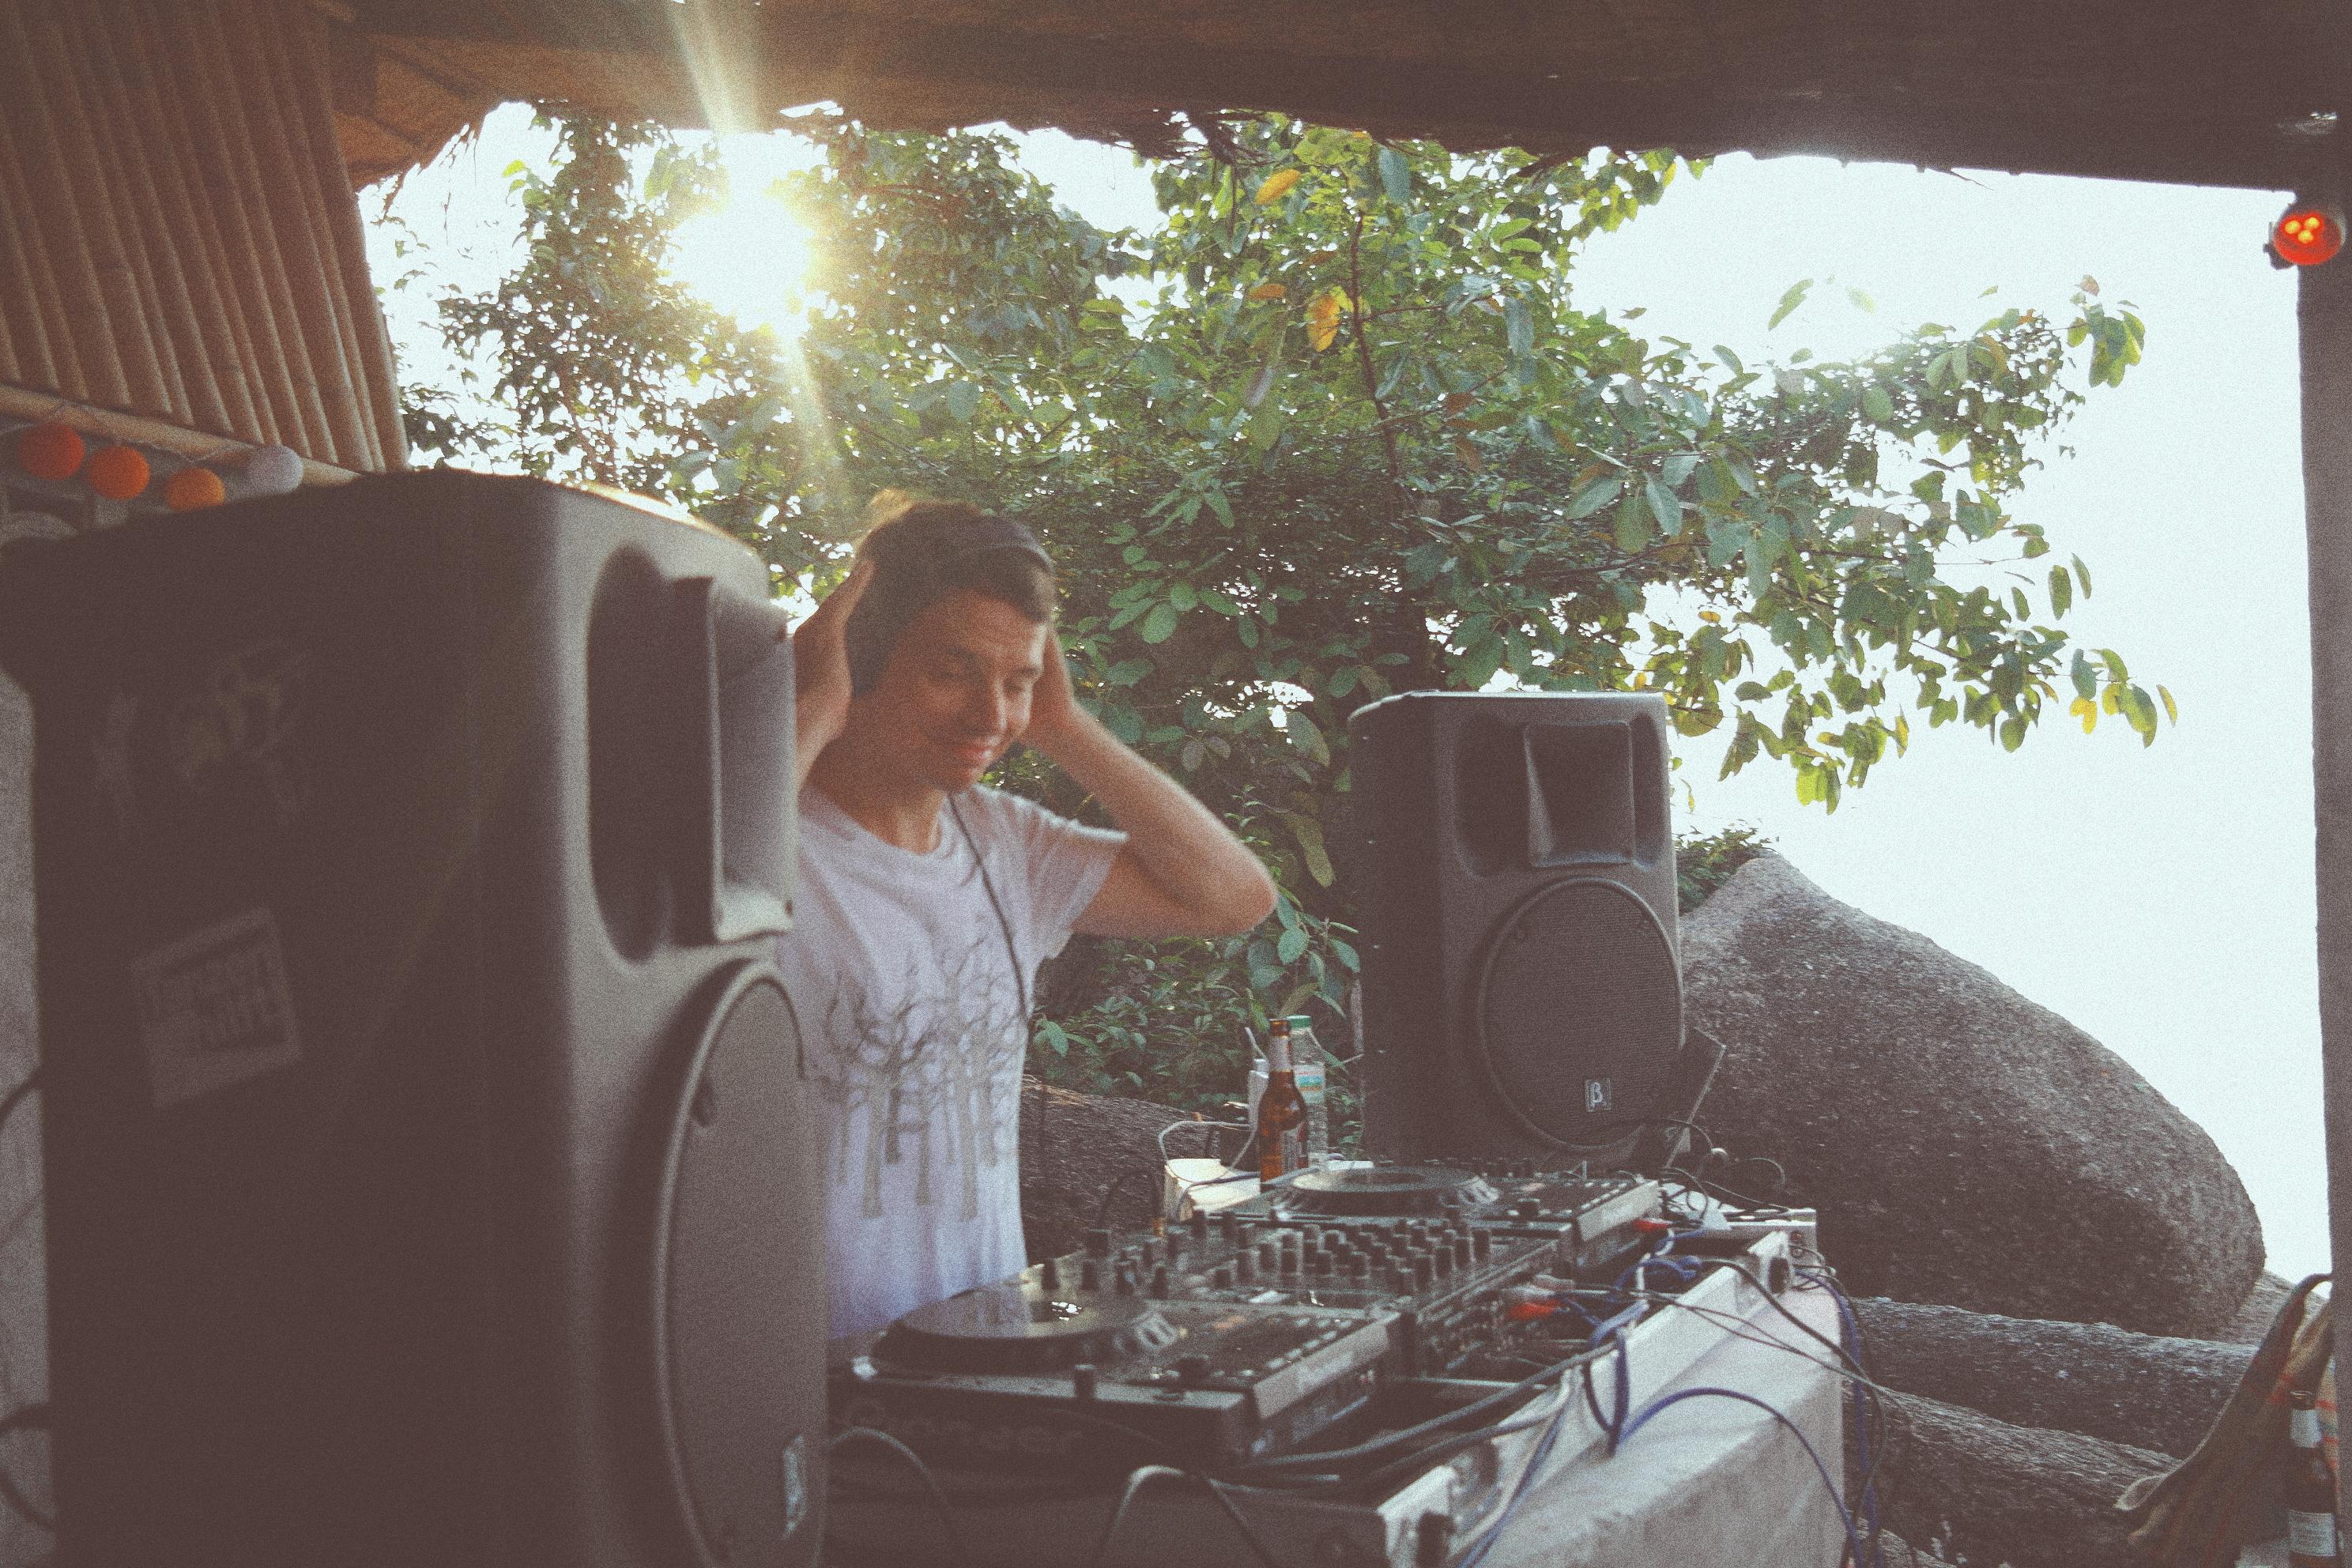 LA VIDA LOCA Party With DJ Alle Farben at Sunset Pearl Koh Phangan